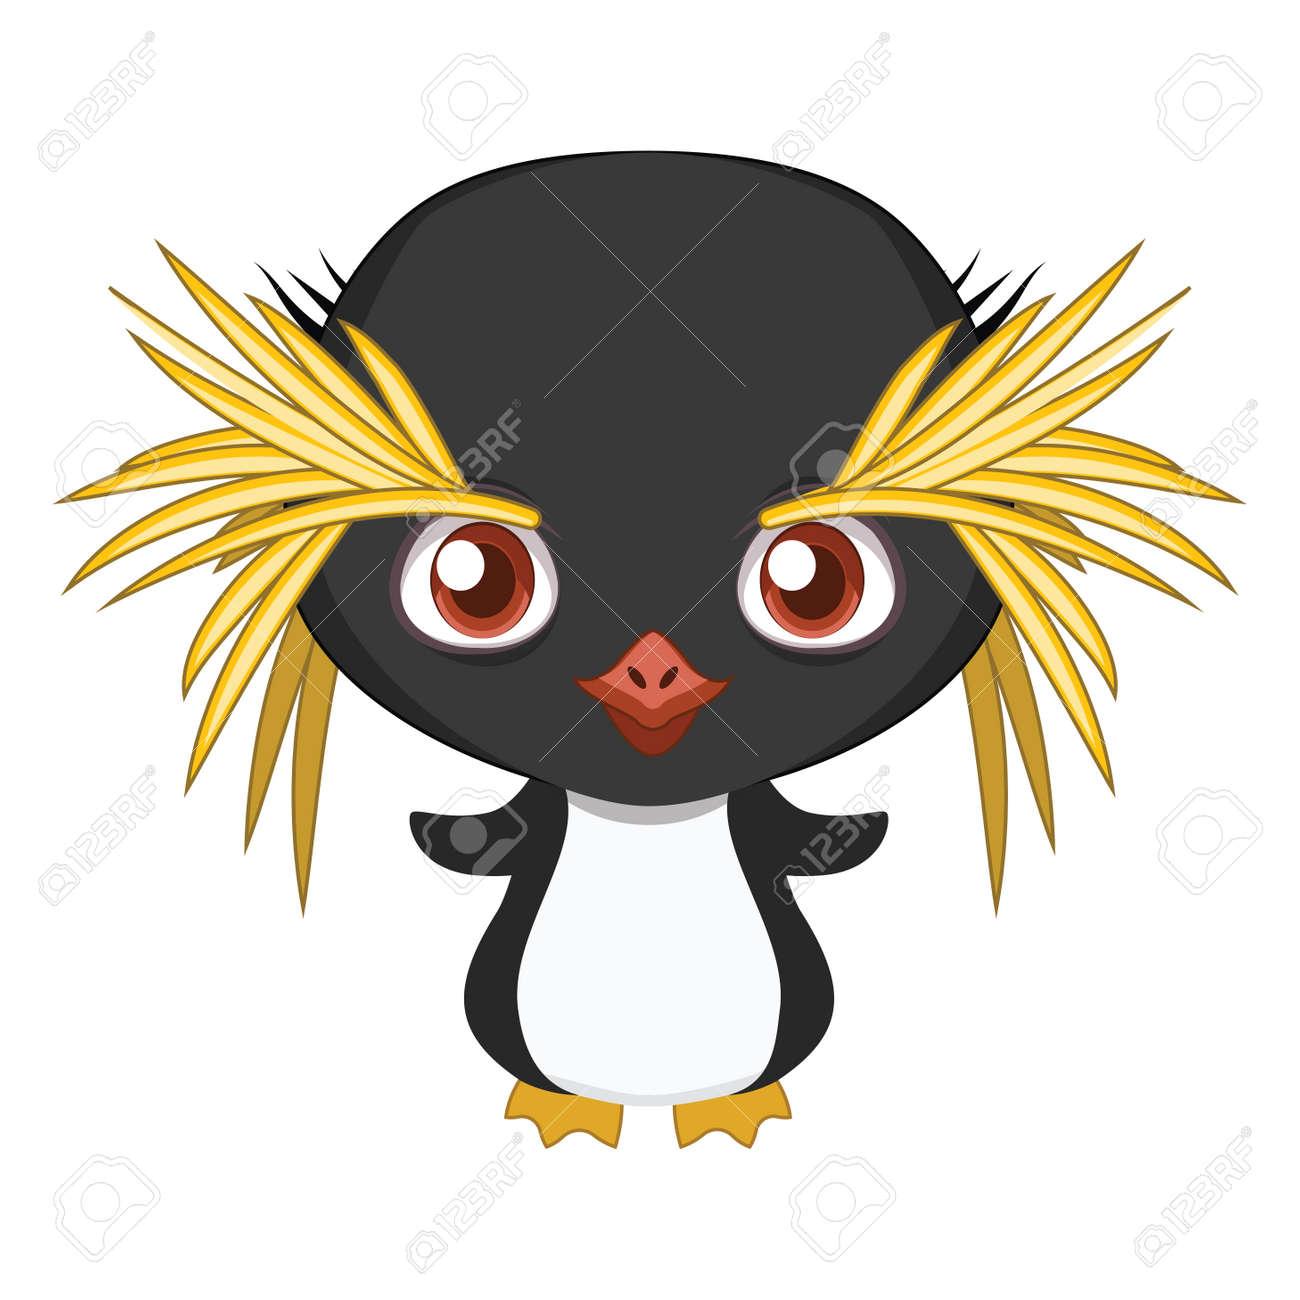 Cute Stylized Cartoon Macaroni Penguin Illustration For Fun